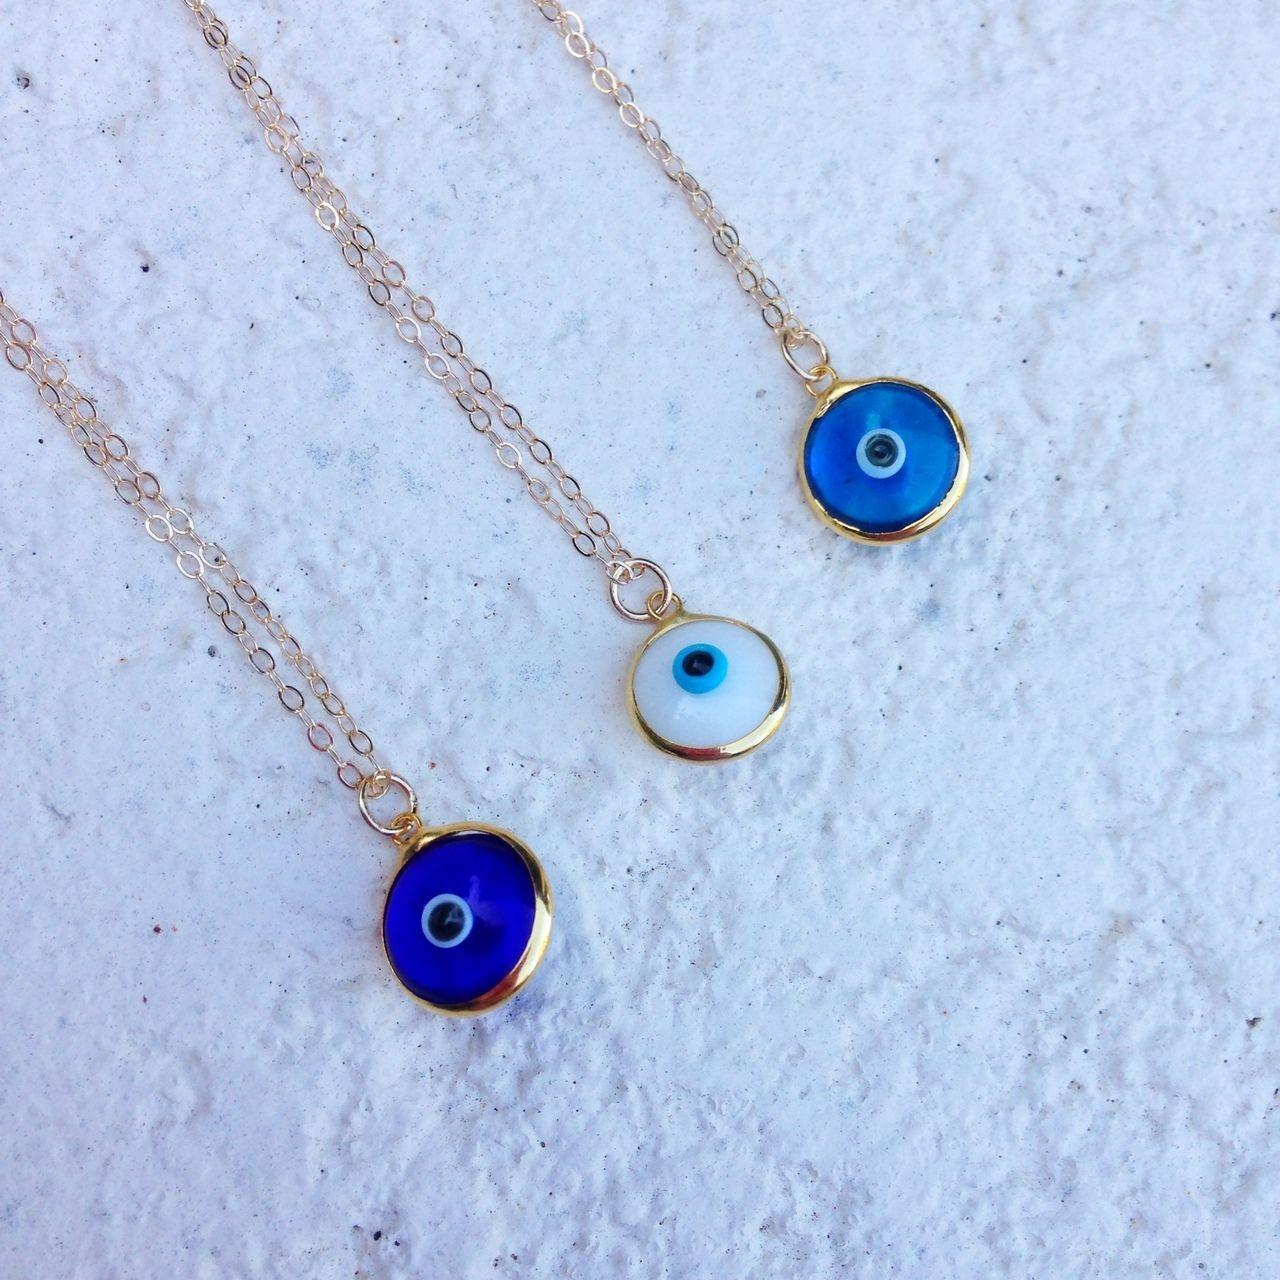 clover charm necklace eye evil eye jewelry blue evil eye evil eye charm necklace Evil eye necklace gold chain necklace evil eye beads